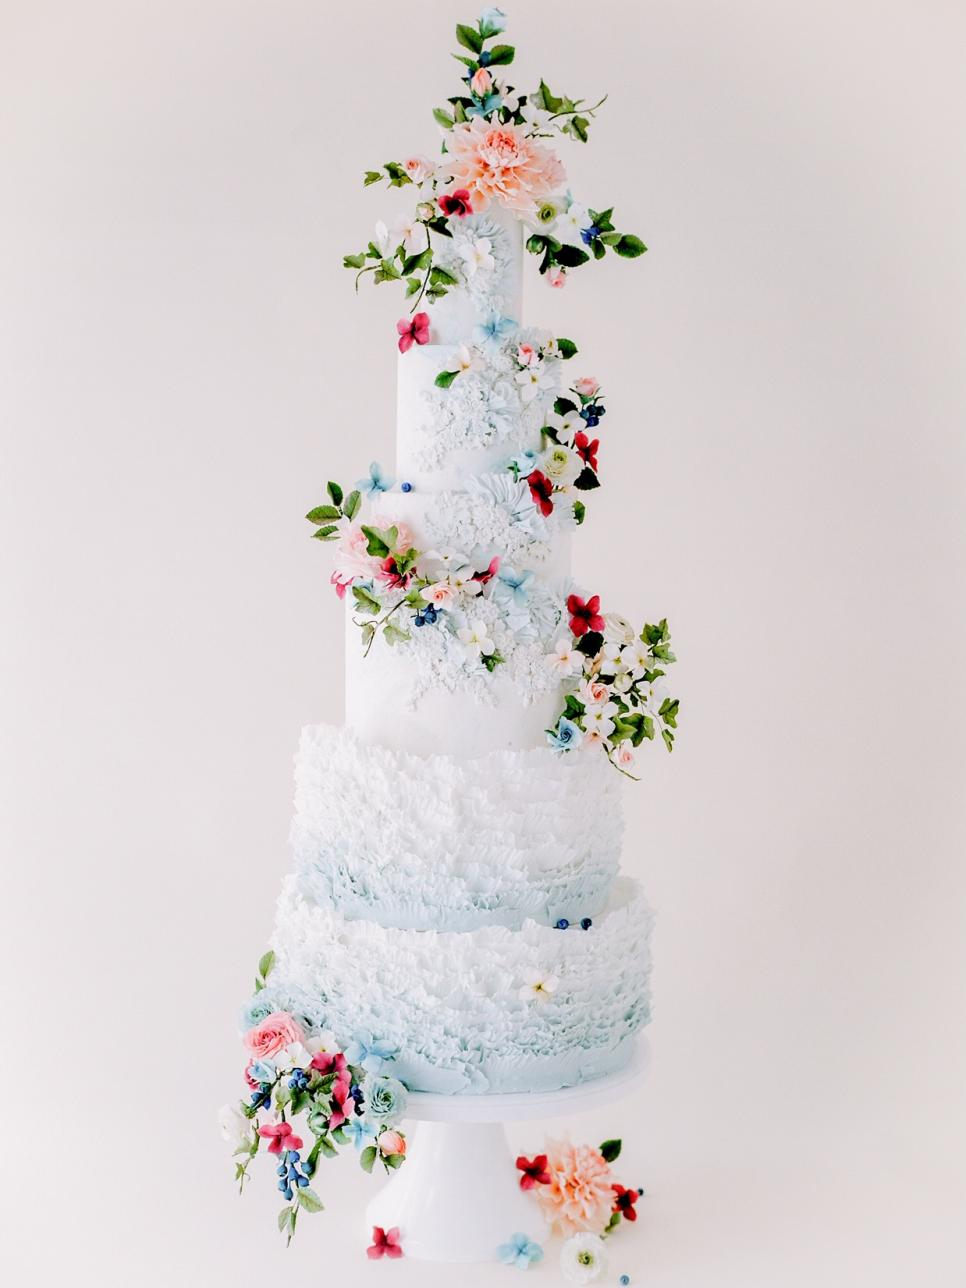 New Wedding Cake Trends in 2019 | Weddings | TLC.com